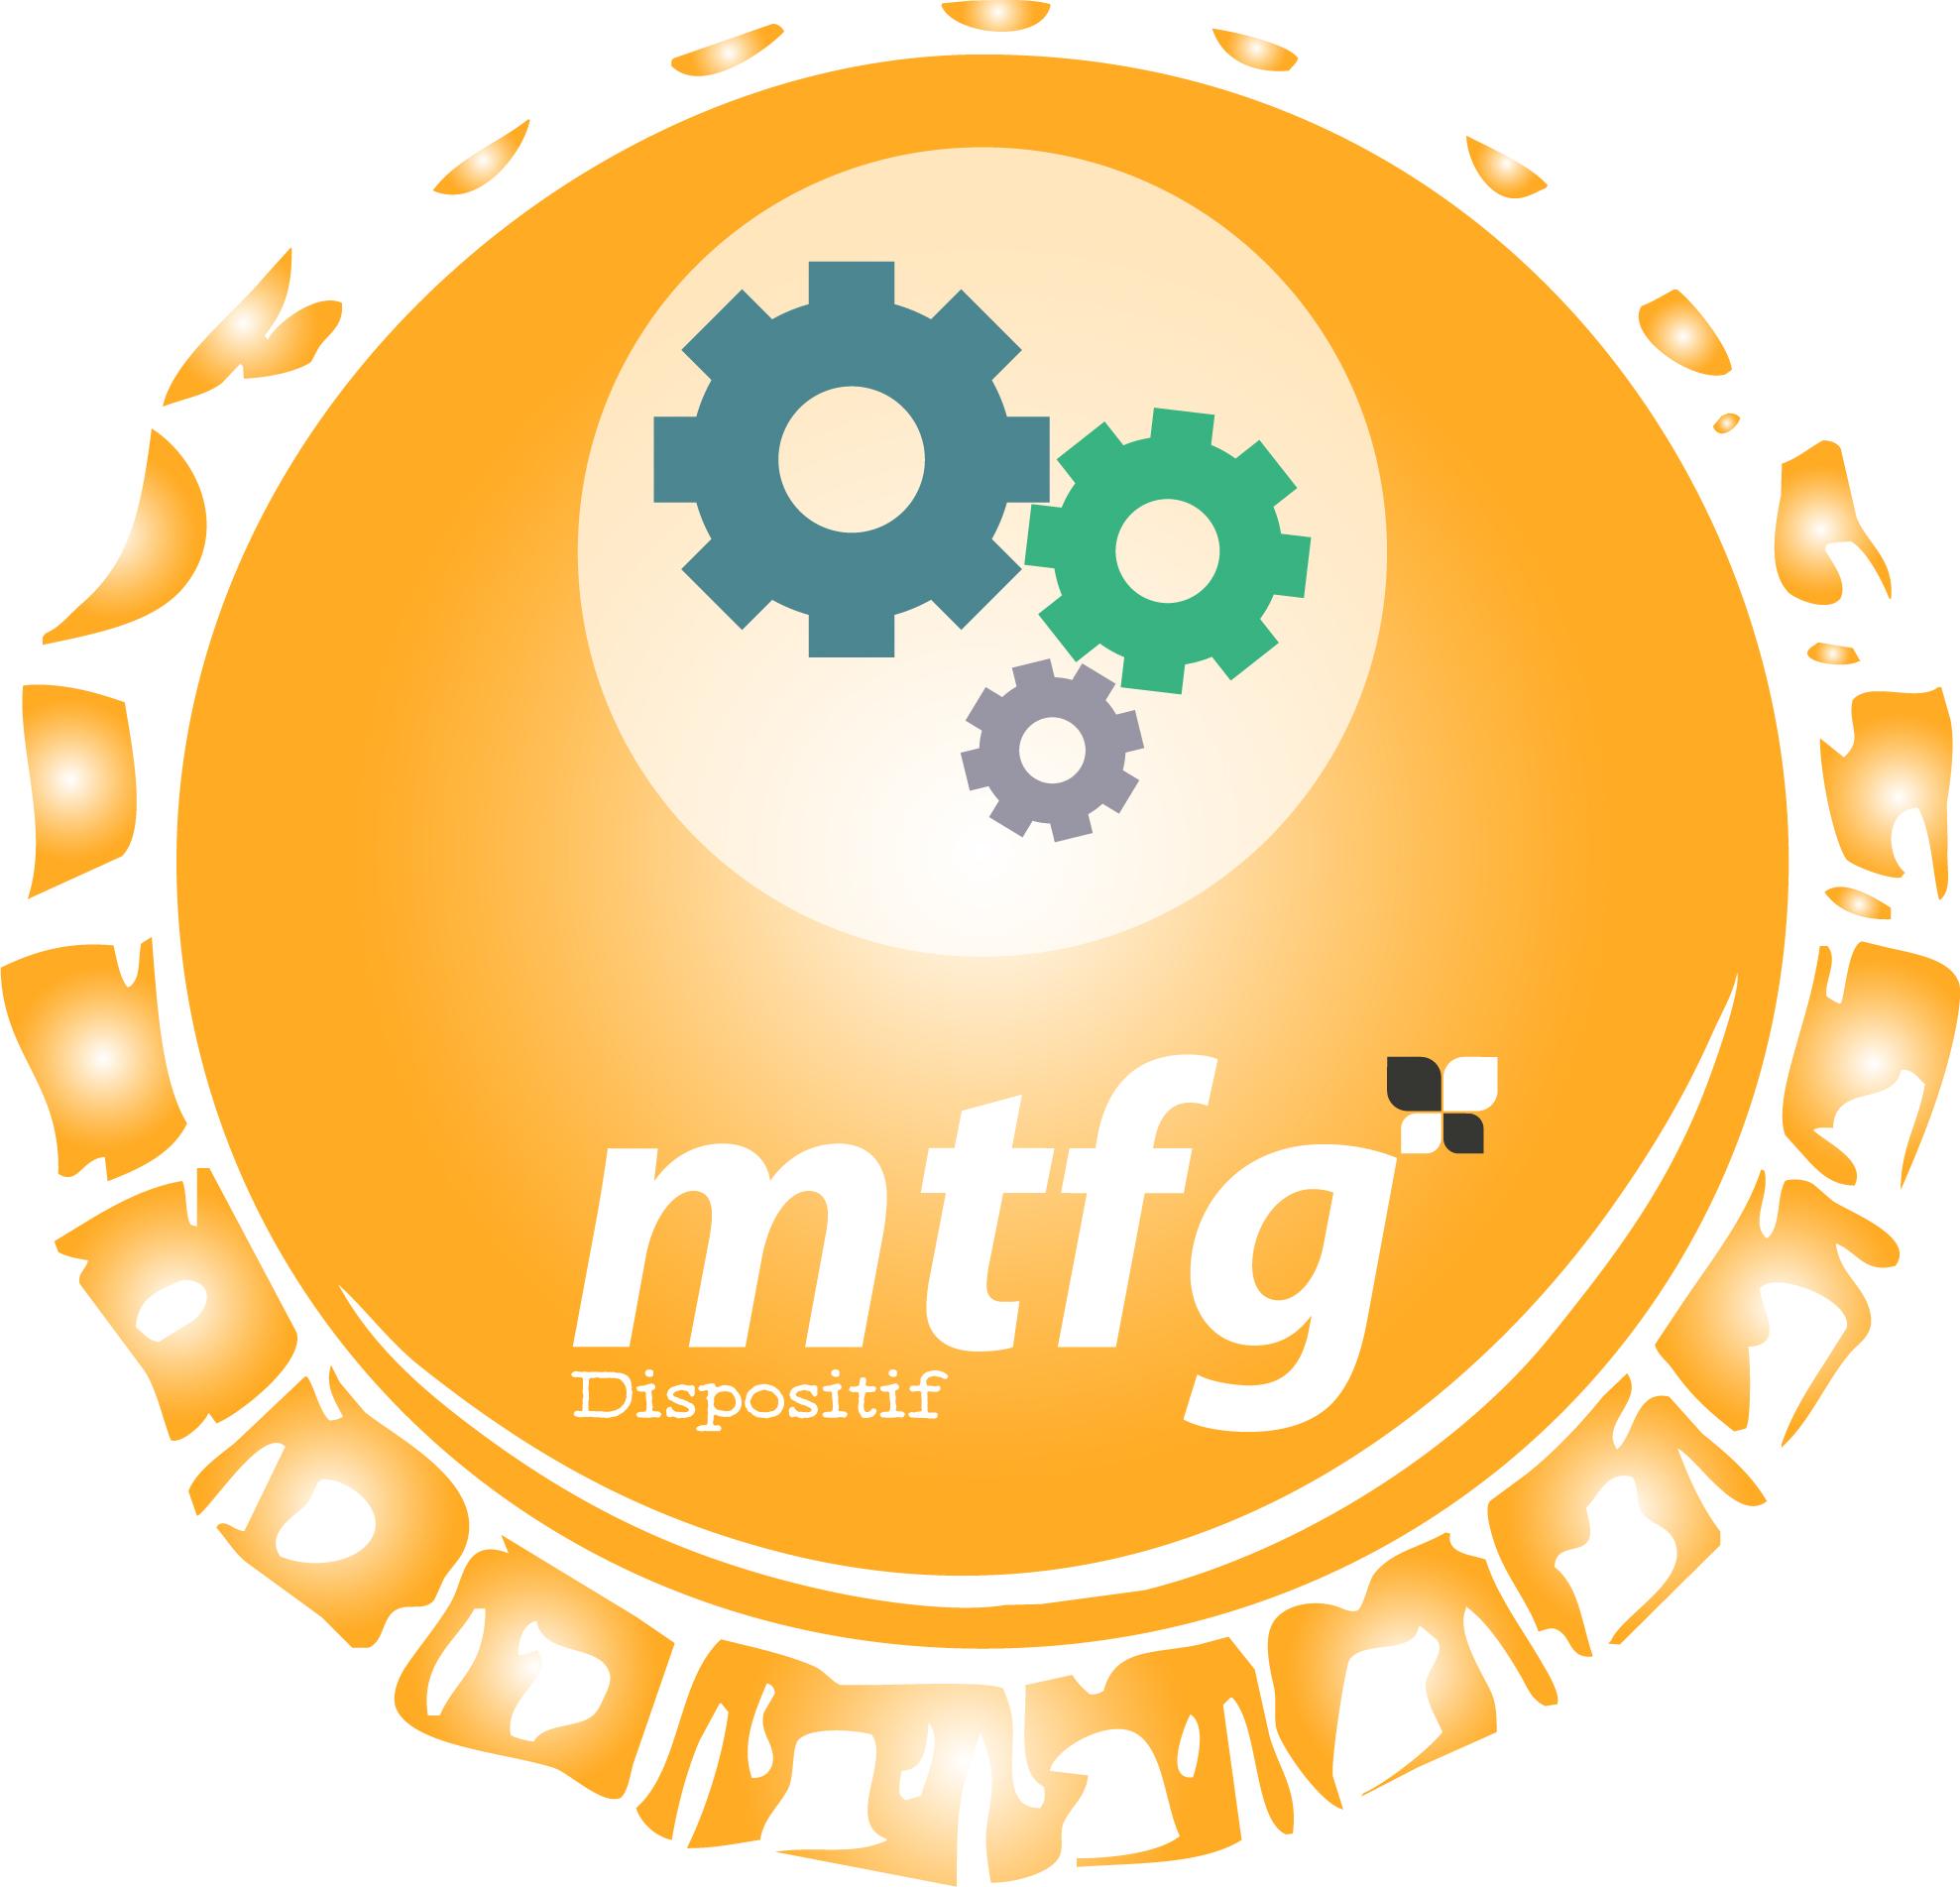 MTFG Dispositif